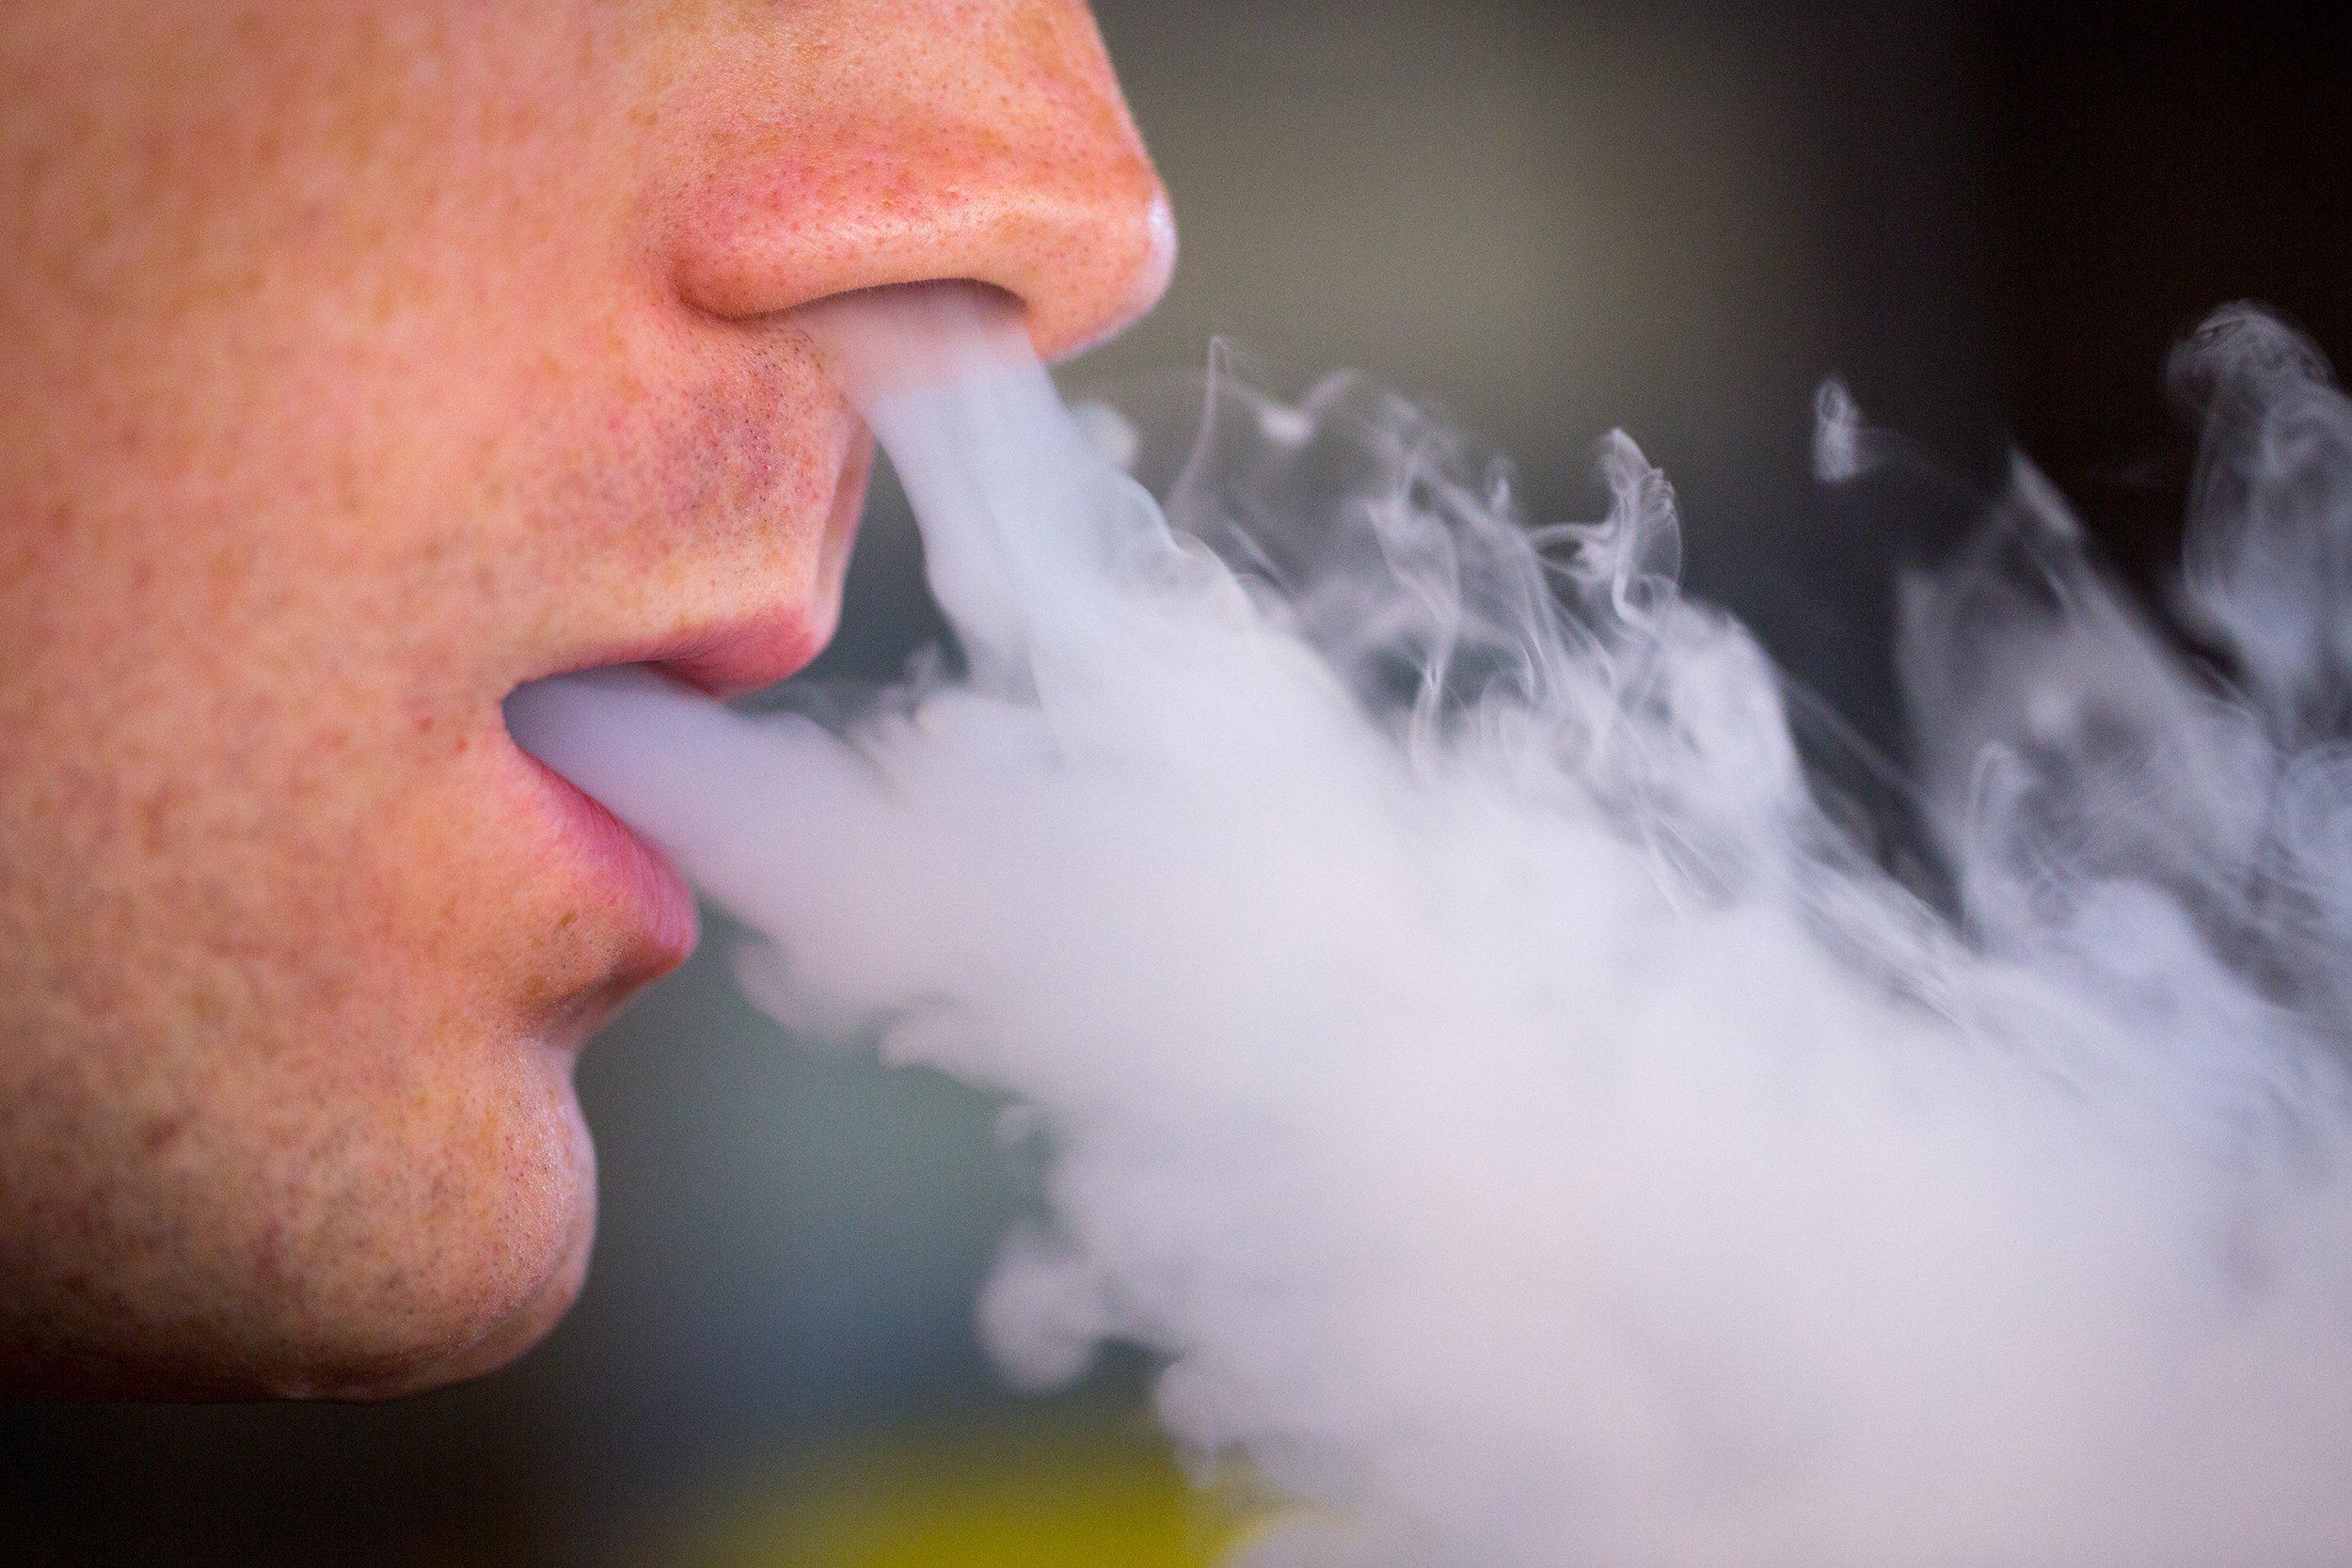 Image: E-cigarette user exhales vapor